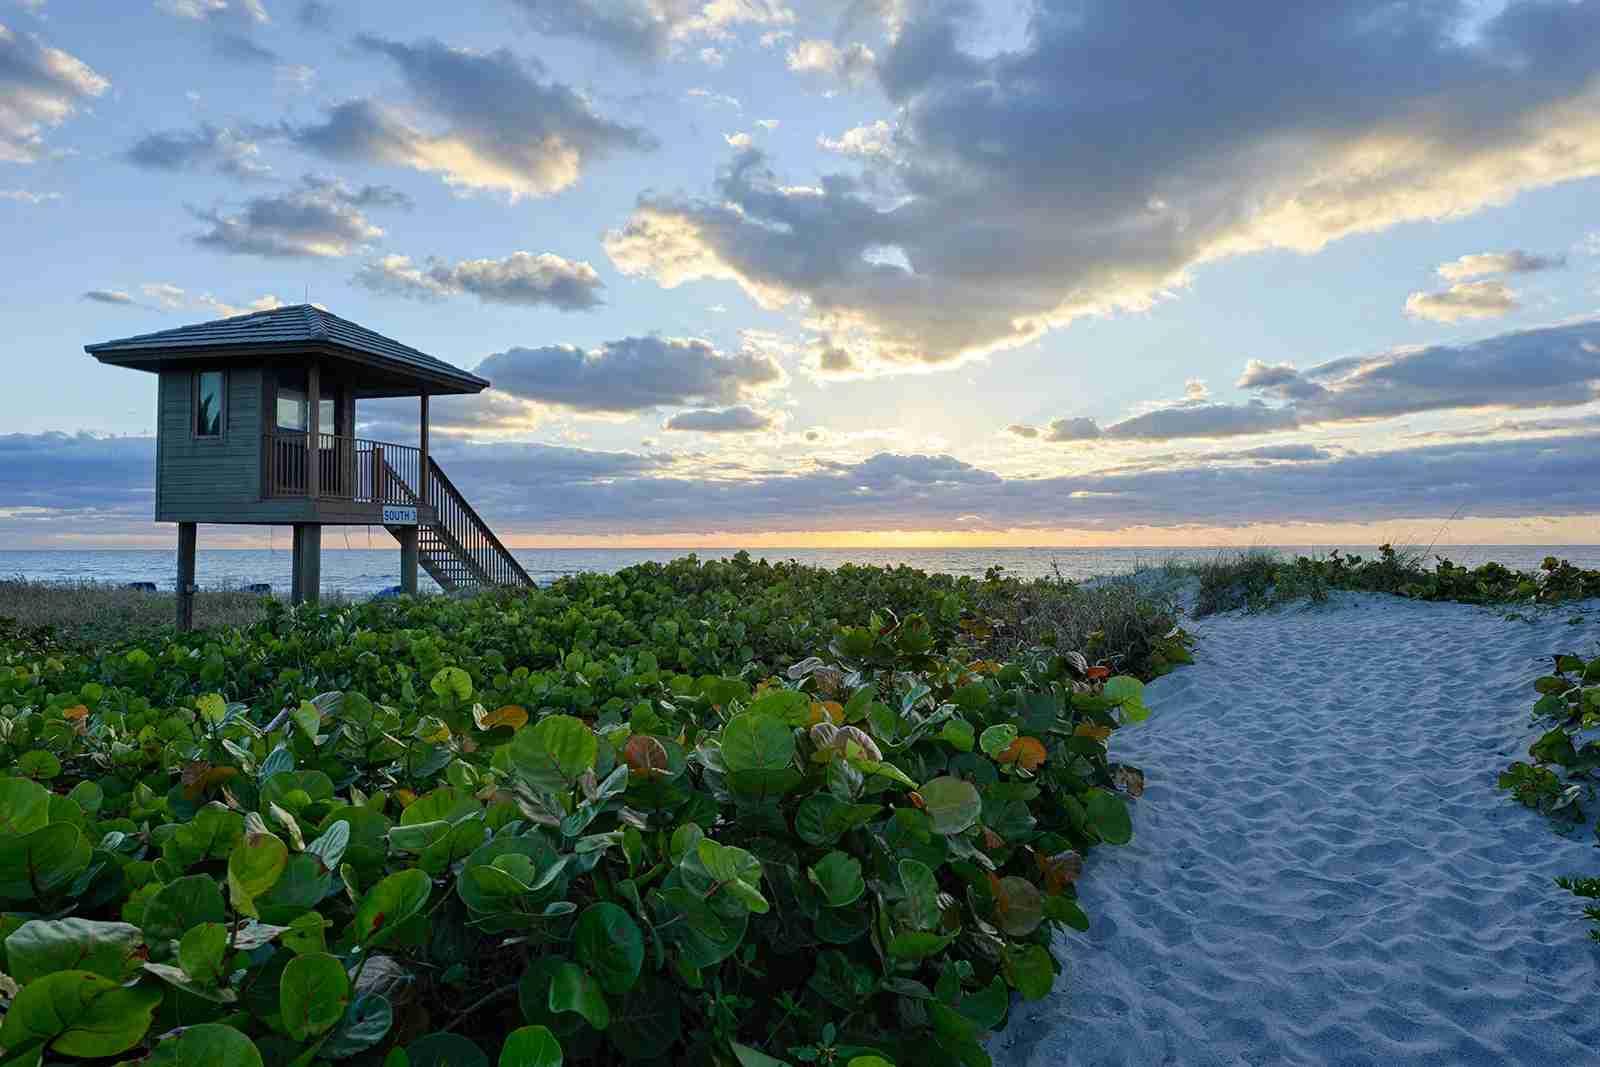 Delray Beach Boca Raton Florida Sunset Tower